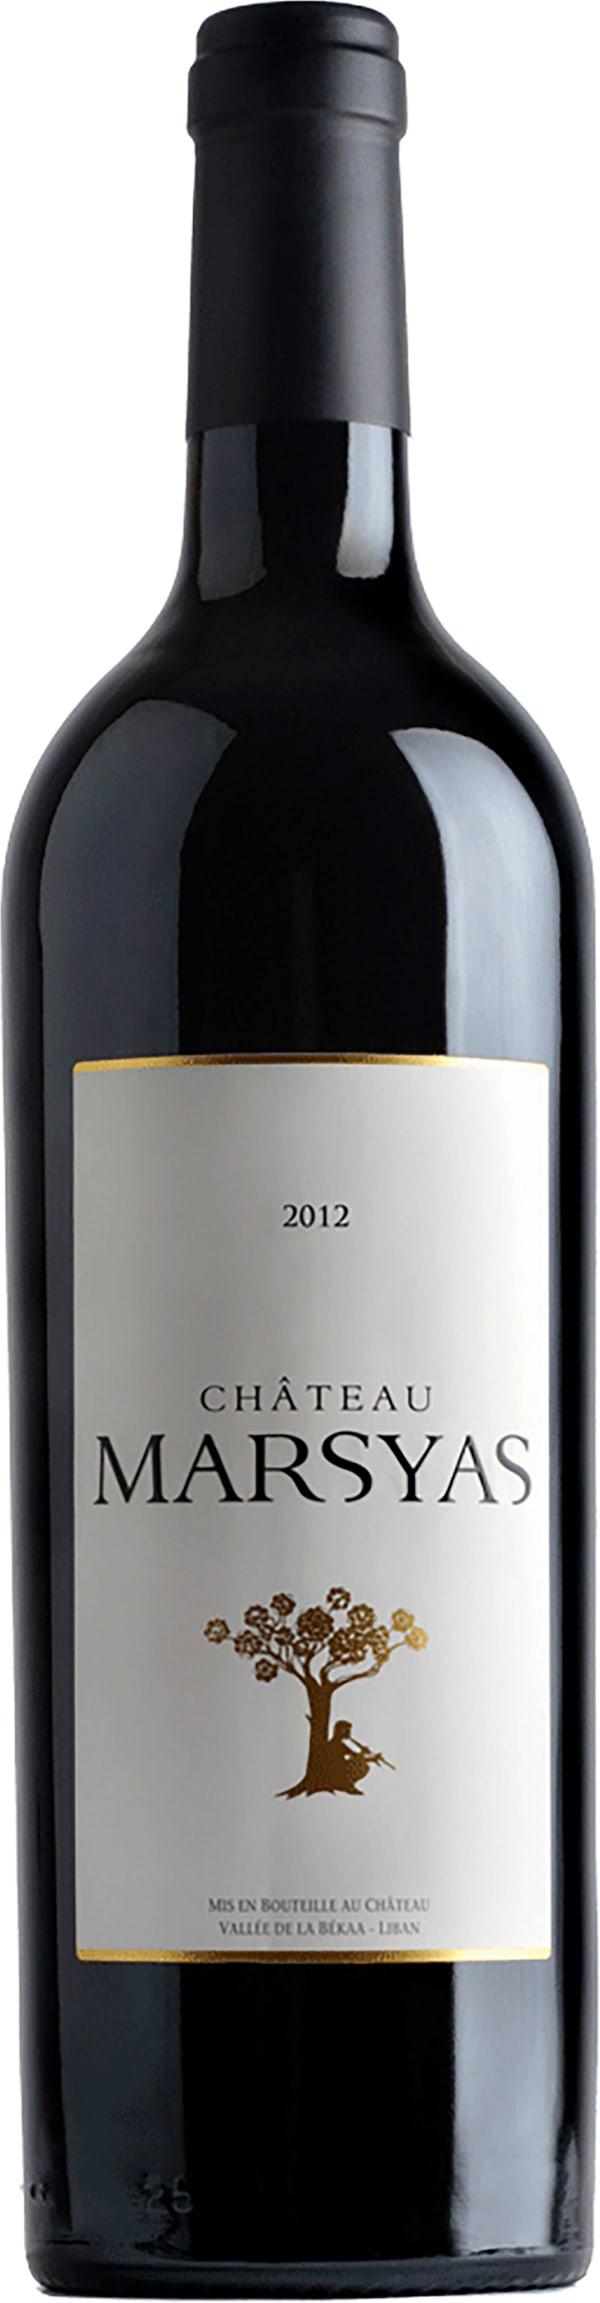 Château Marsyas 2012